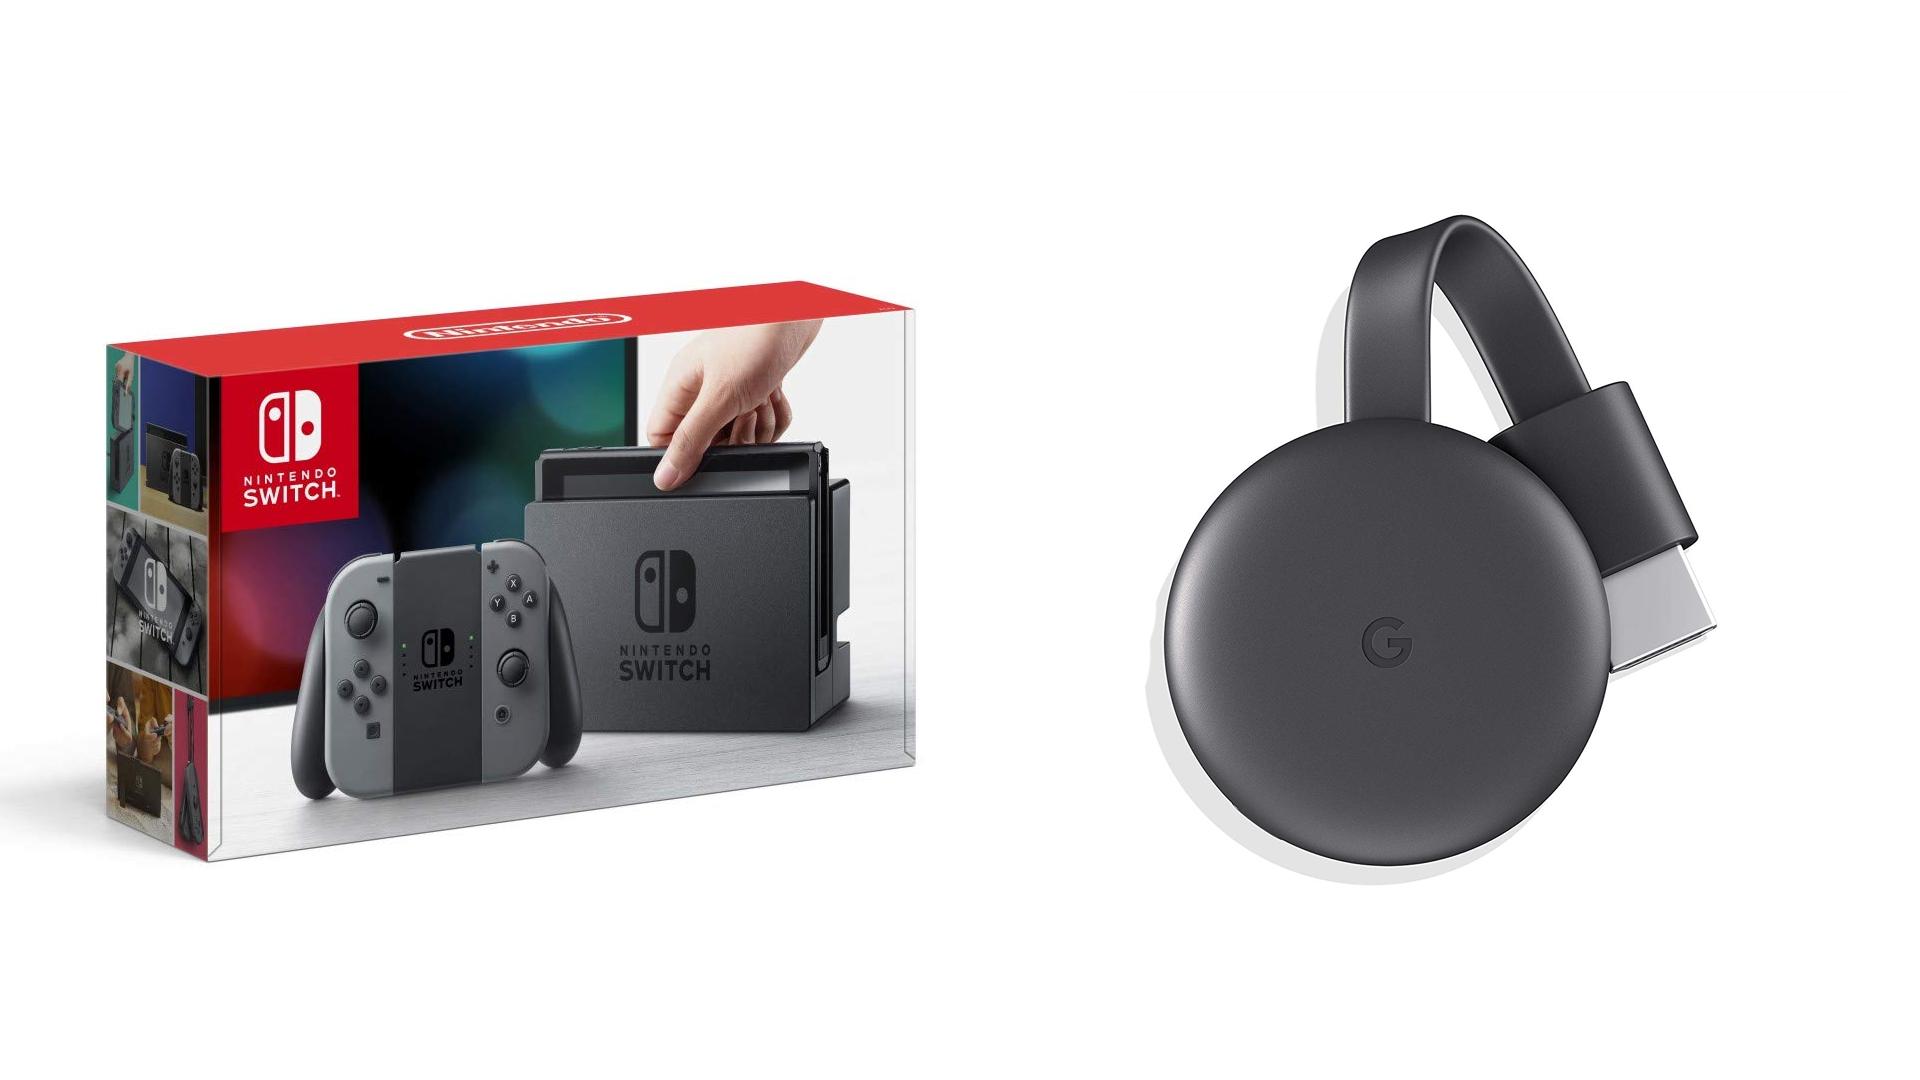 The Nintendo Switch and the Google Chromecast.